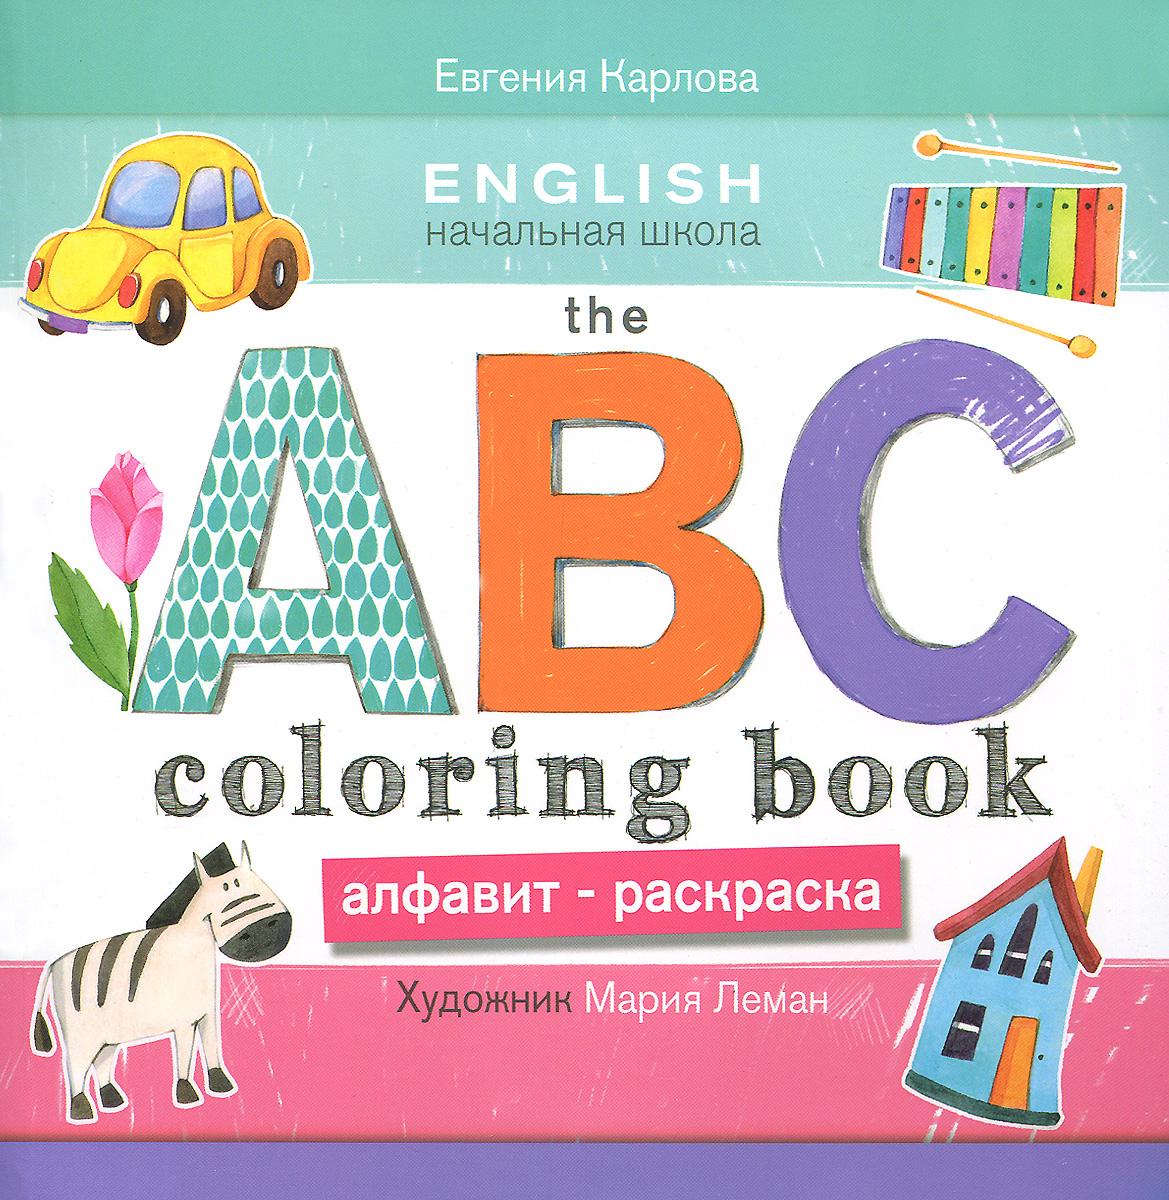 Е. Л. Карлова The ABC Coloring Book / Алфавит-раскраска макси раскраска английский алфавит